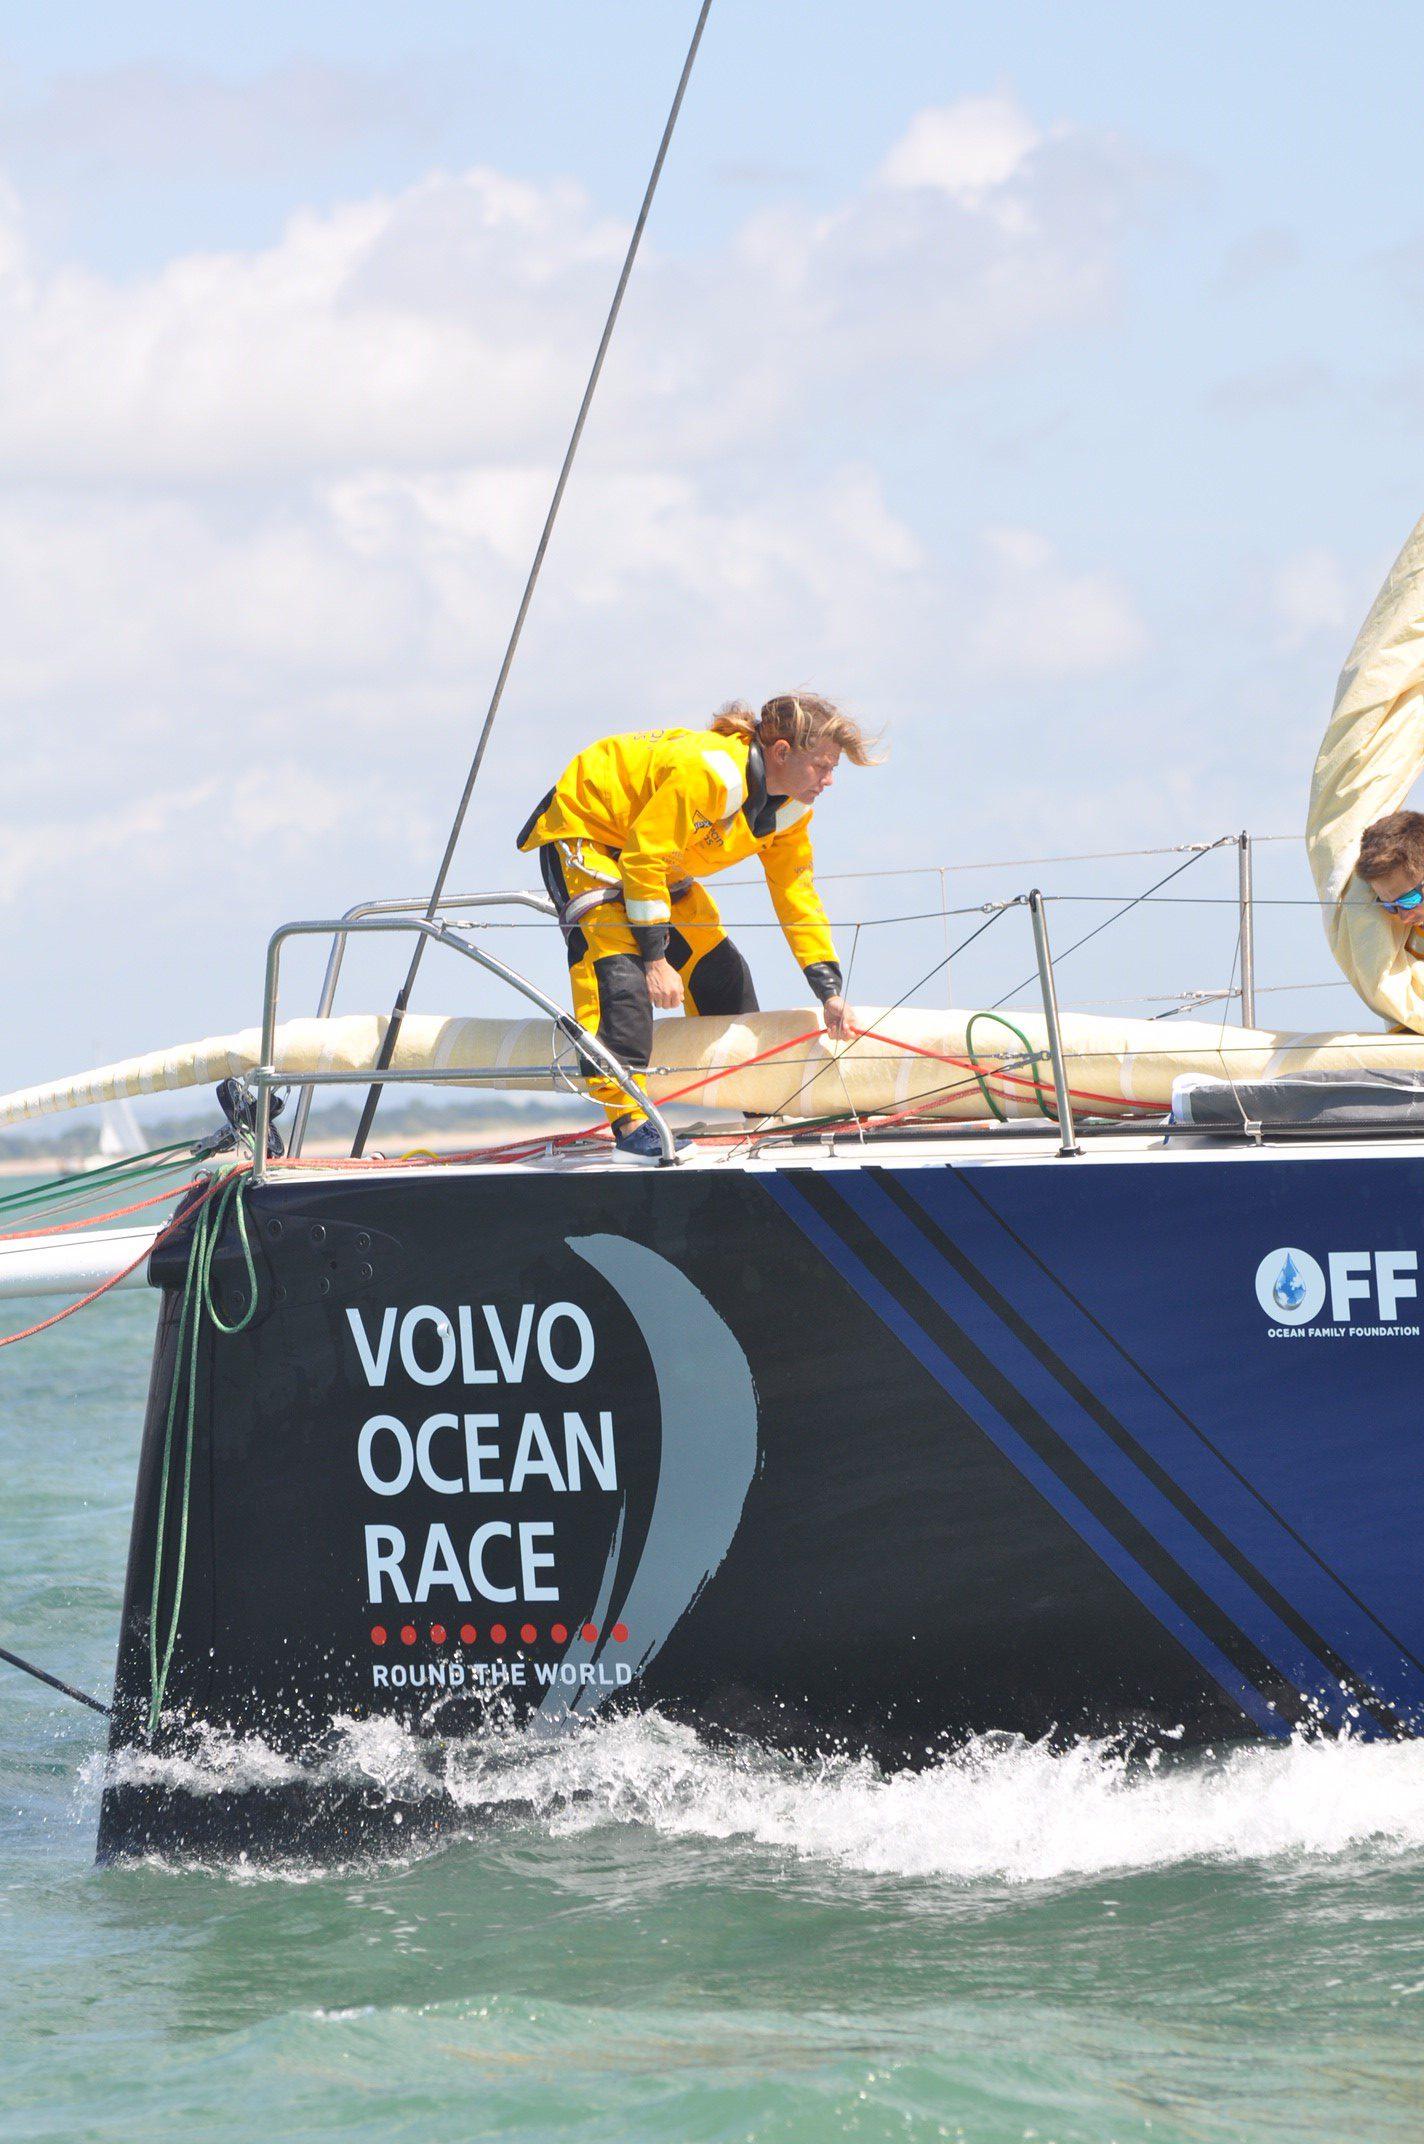 Credit: Nick Bishop/Volvo Ocean Race